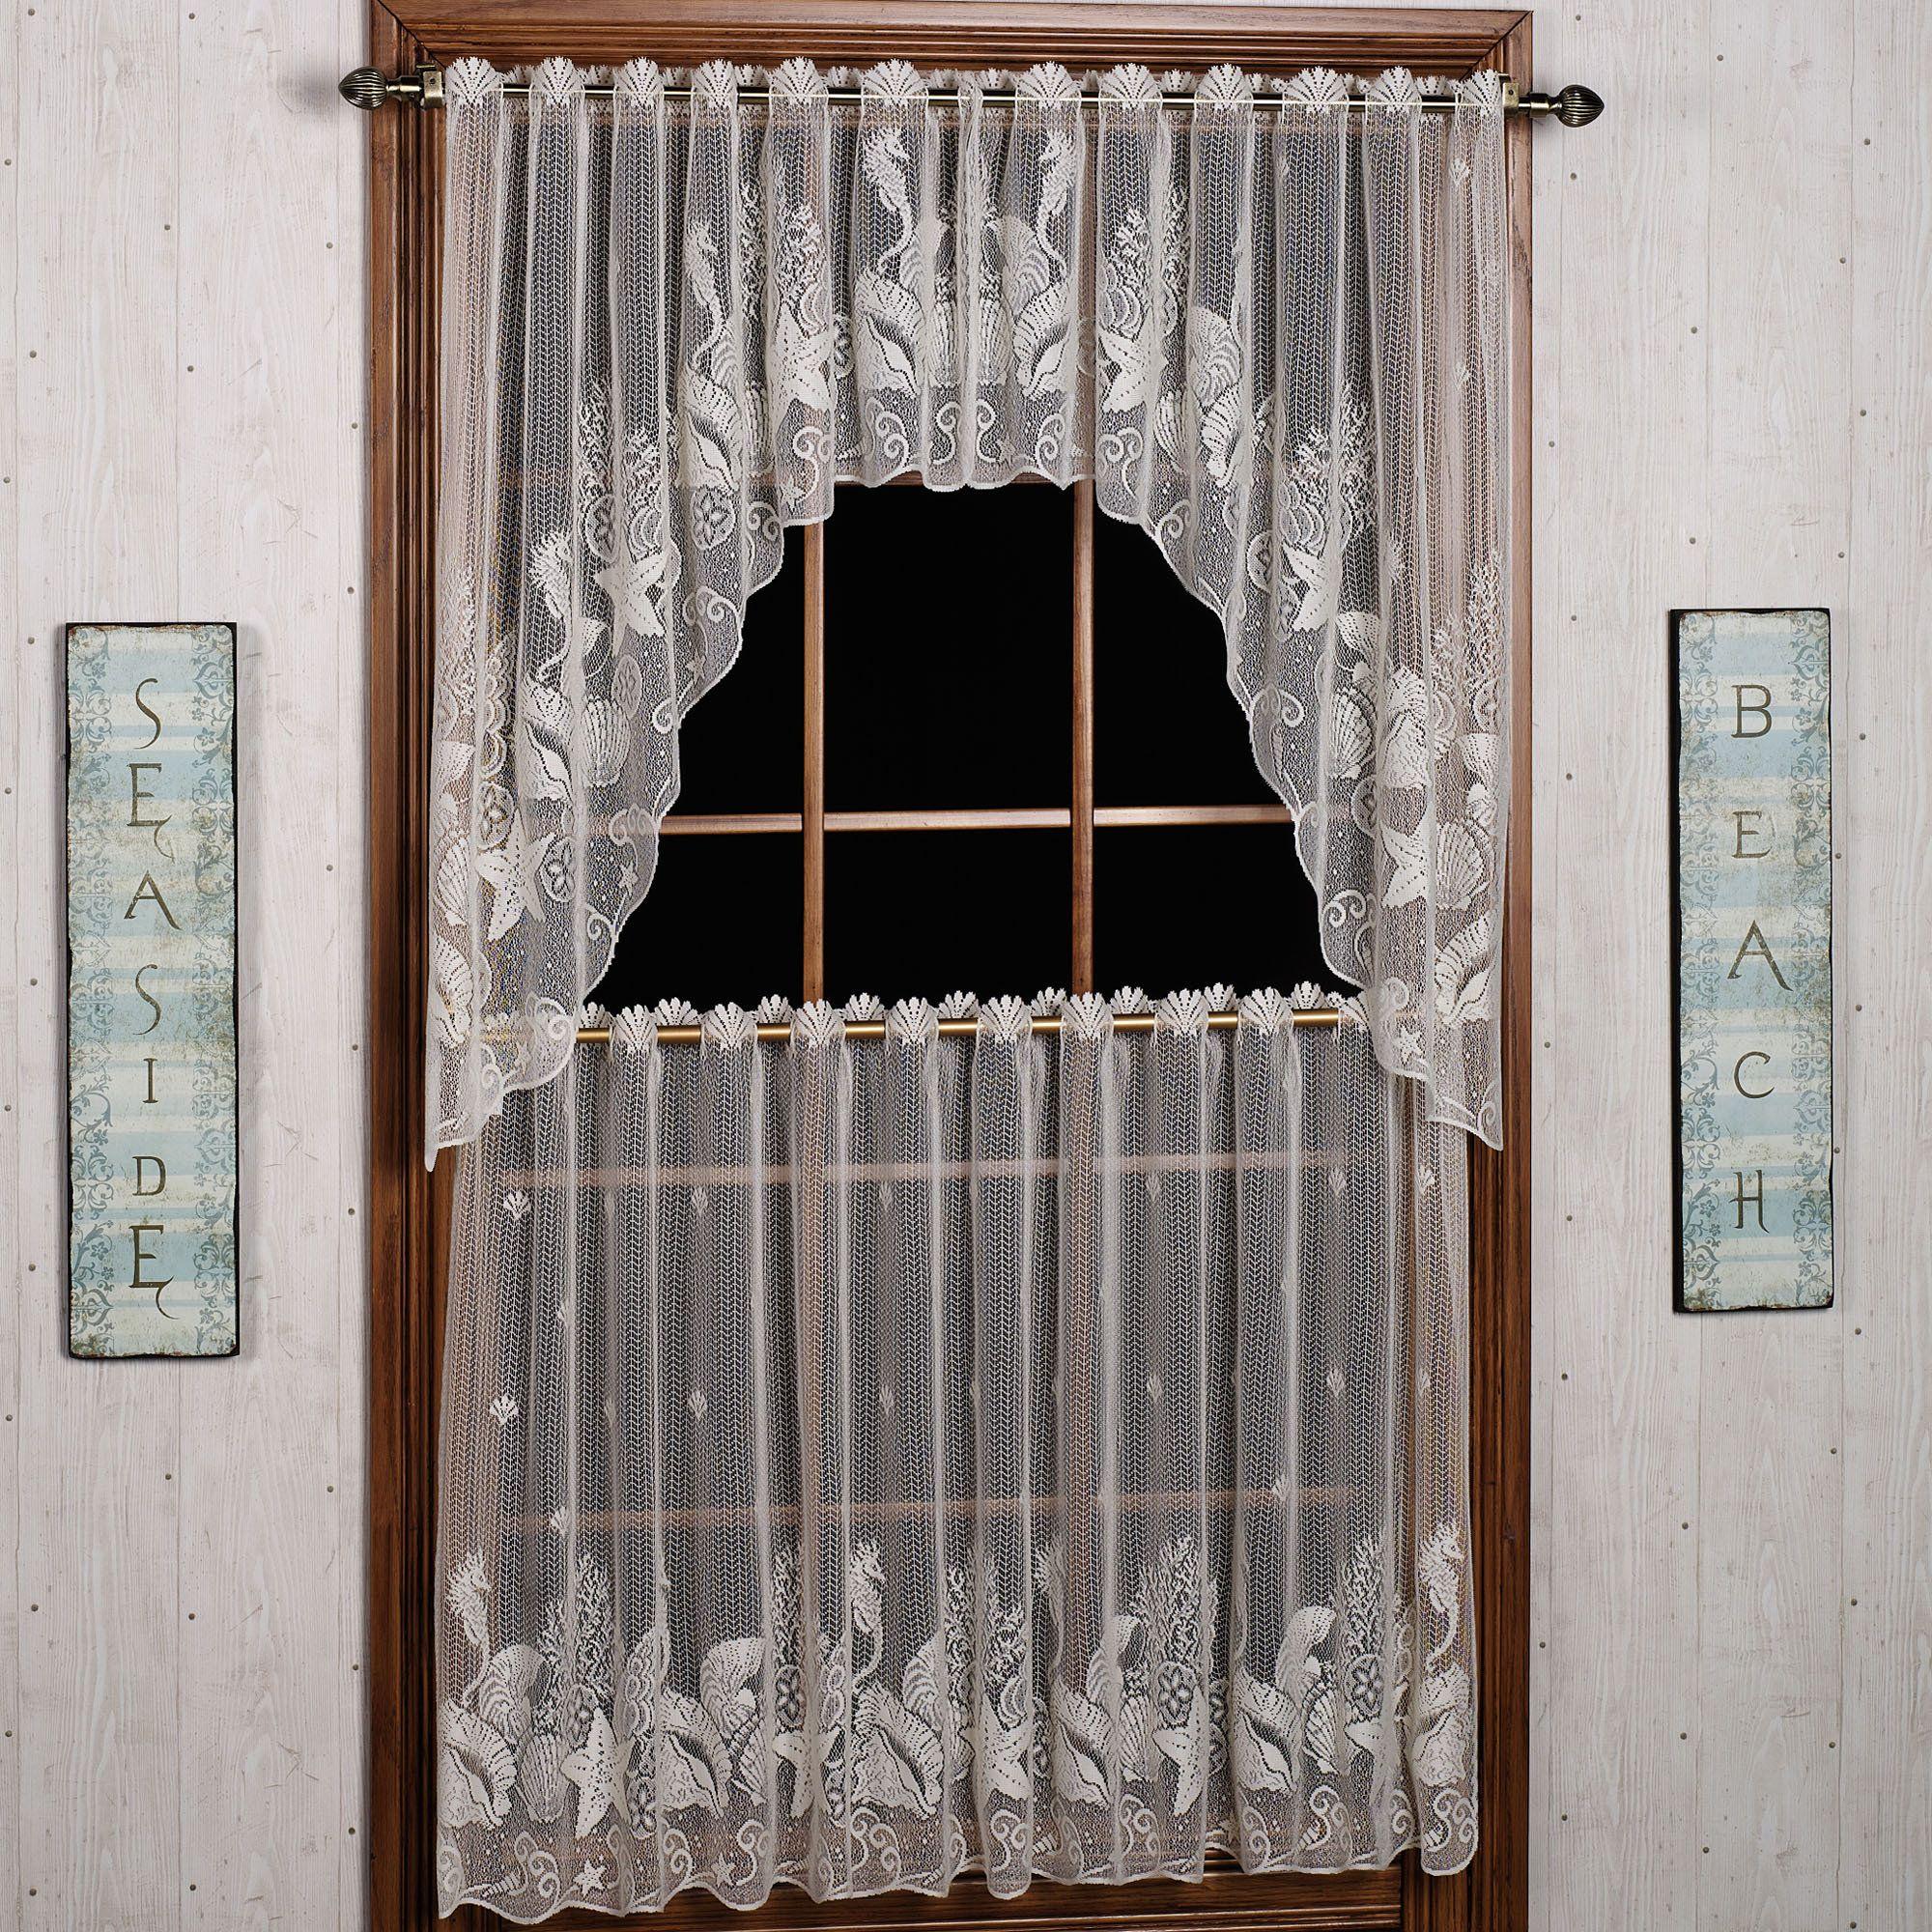 Seascape lace tier window treatment living room pinterest